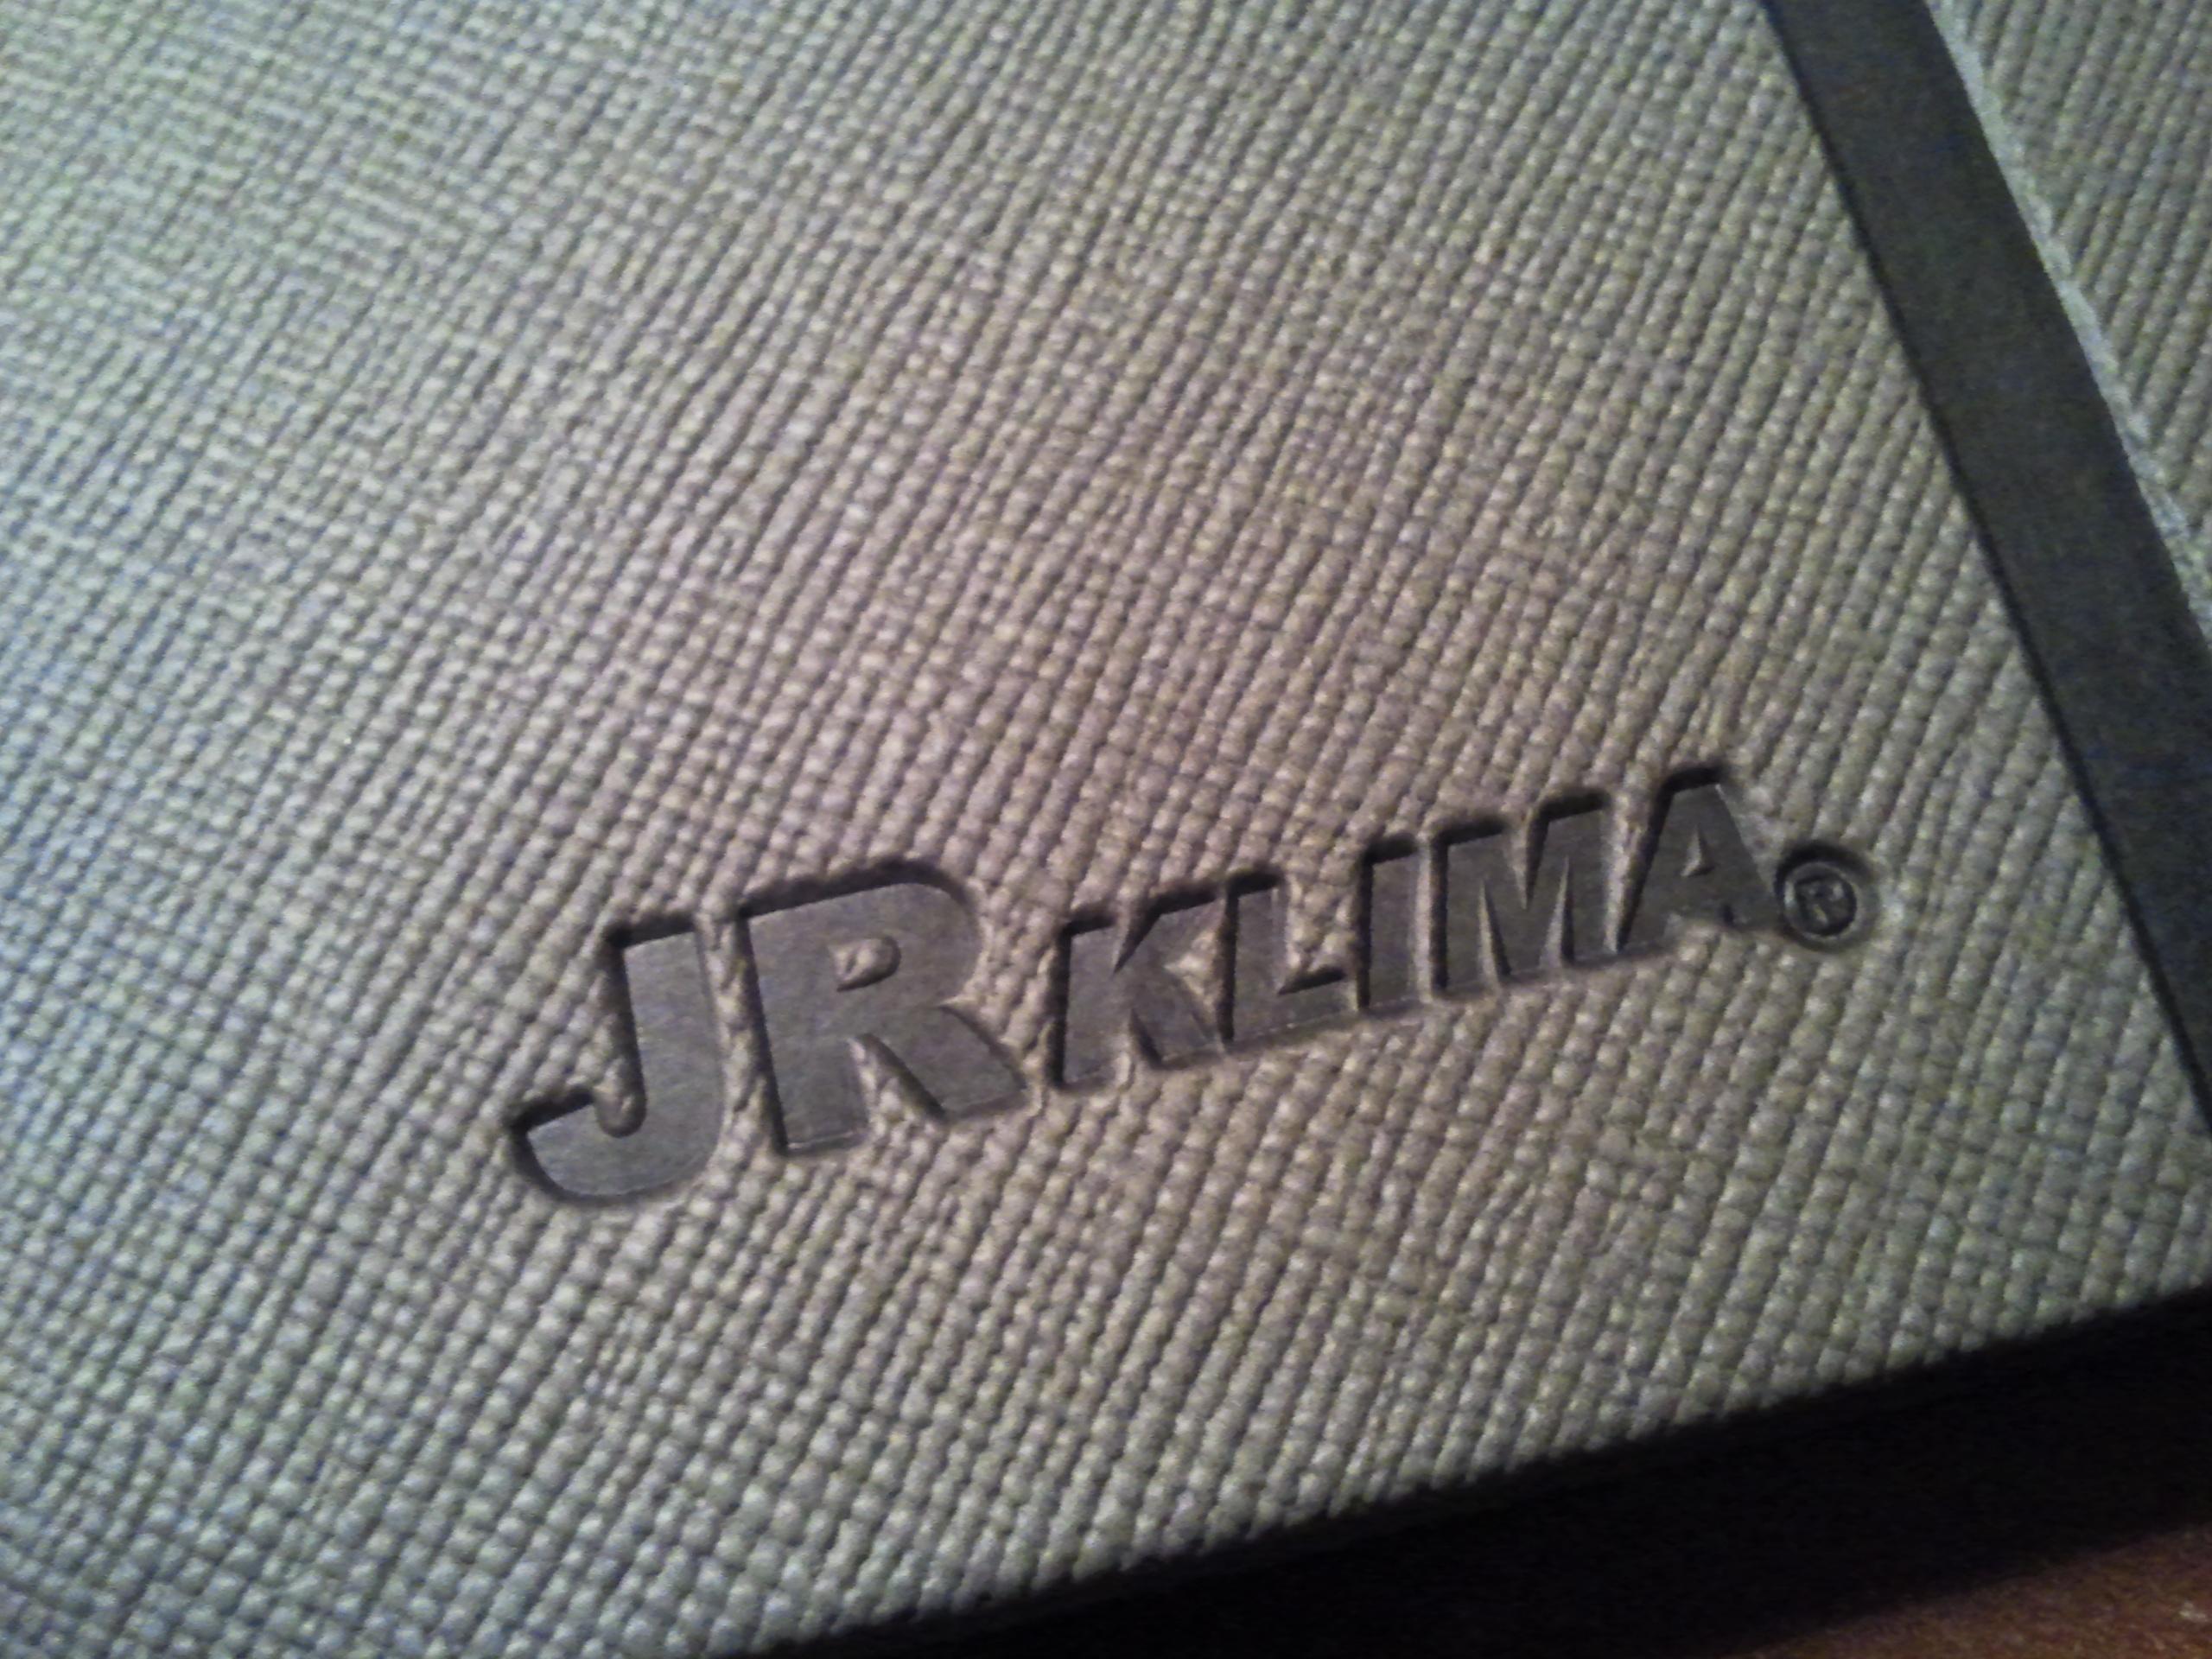 JR Klima